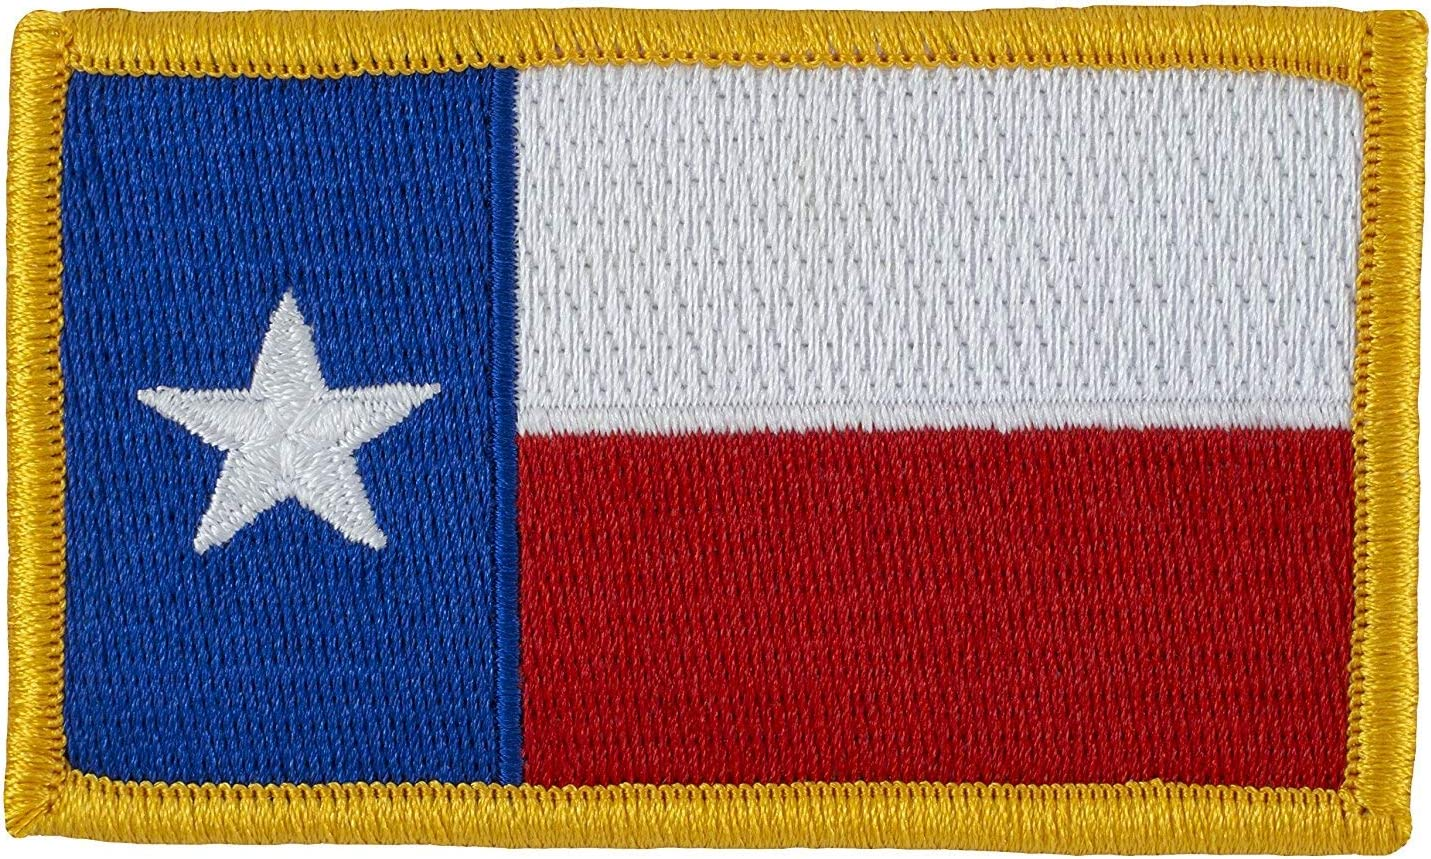 Tactical Texas Estado Bandera Parche (con velcro) hacia adelante a todo color 2